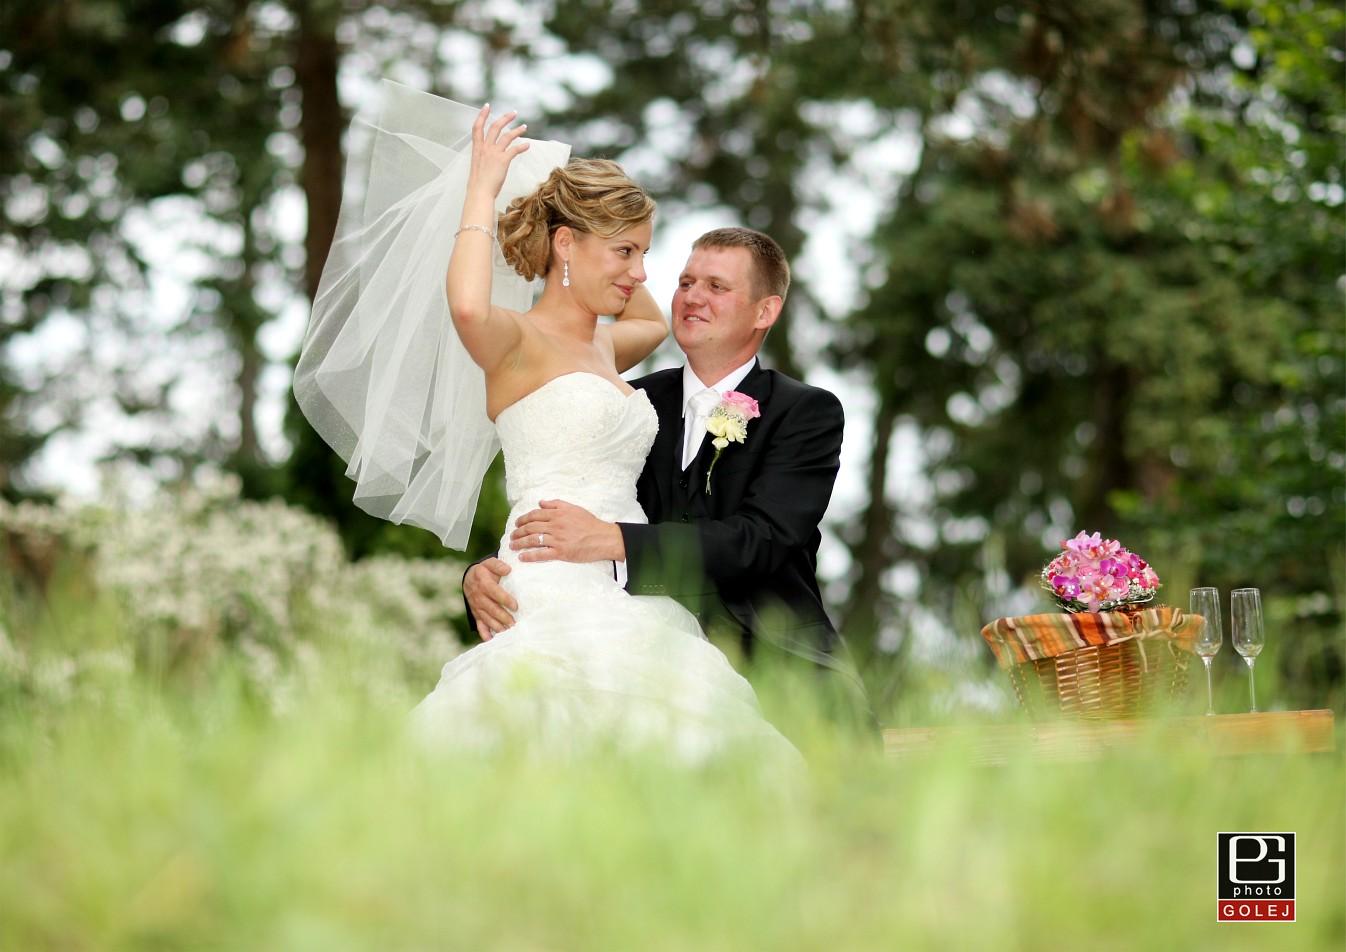 Zamok_topolcianky_svadba